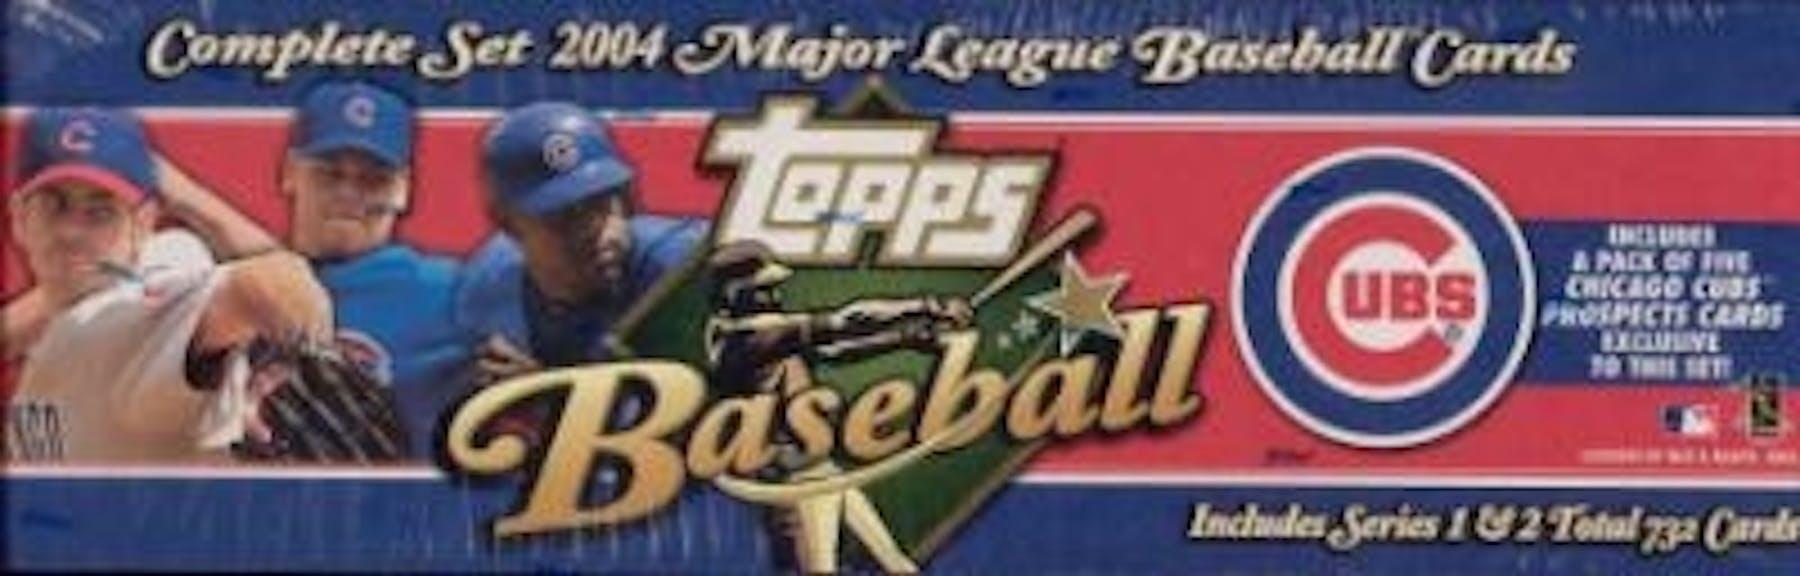 2004 Topps Factory Set Baseball Box Chicago Cubs Very Rare